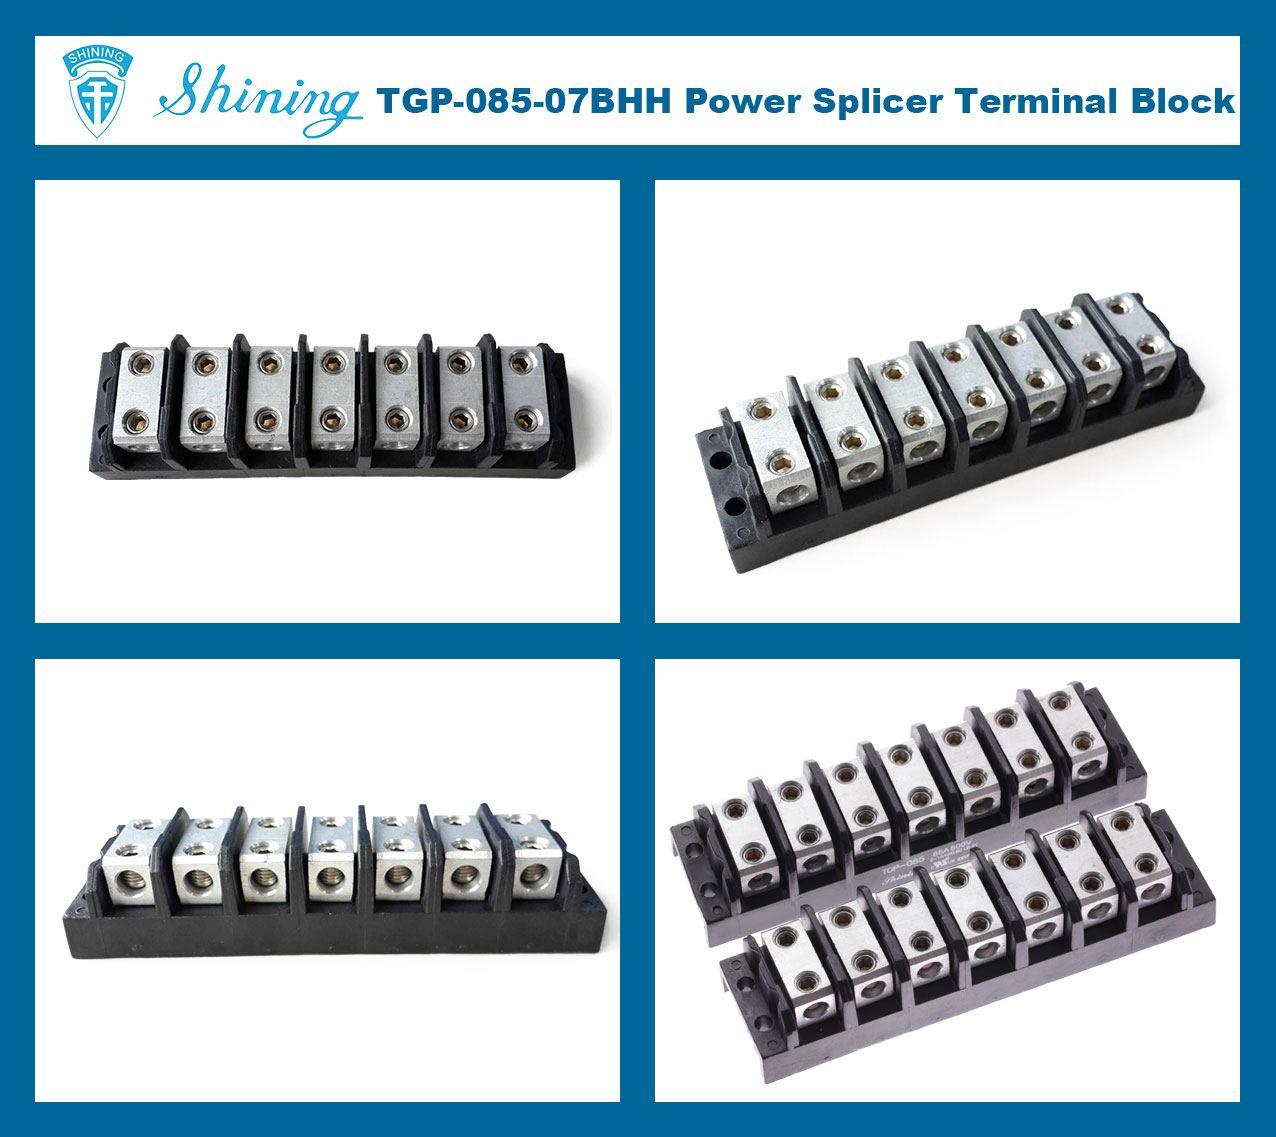 TGP-085-07BHH 600V 85A 7 Way Power Splicer Terminal Block